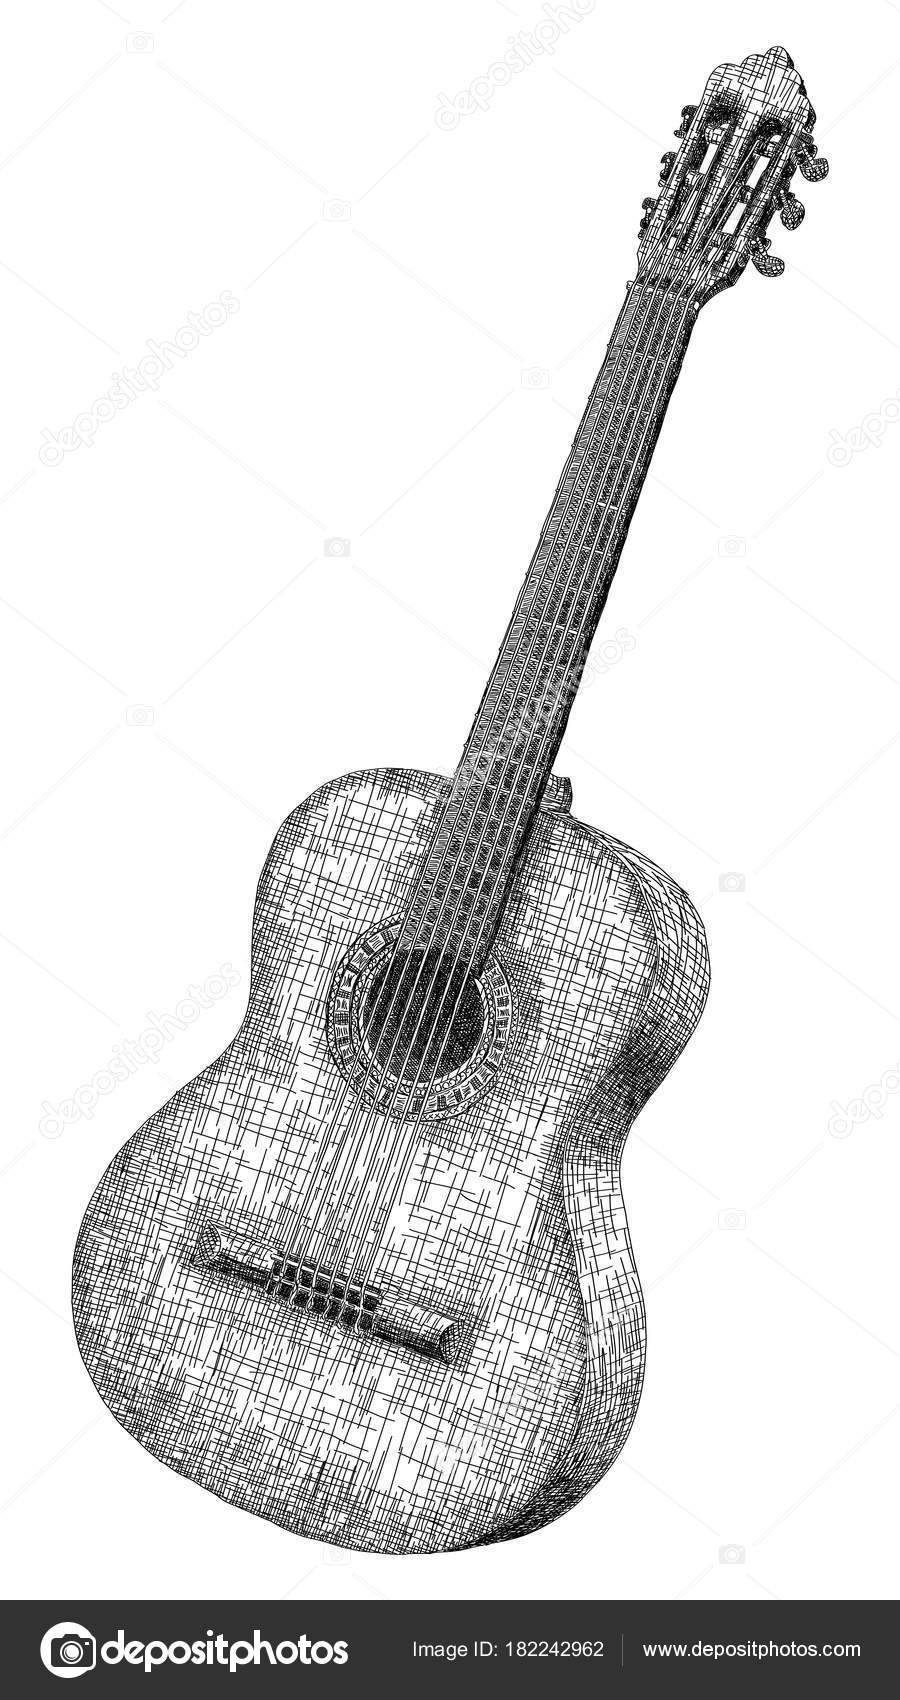 Vektorove Ilustrace Kresba Klasicka Kytara Stock Vektor C Vertyr